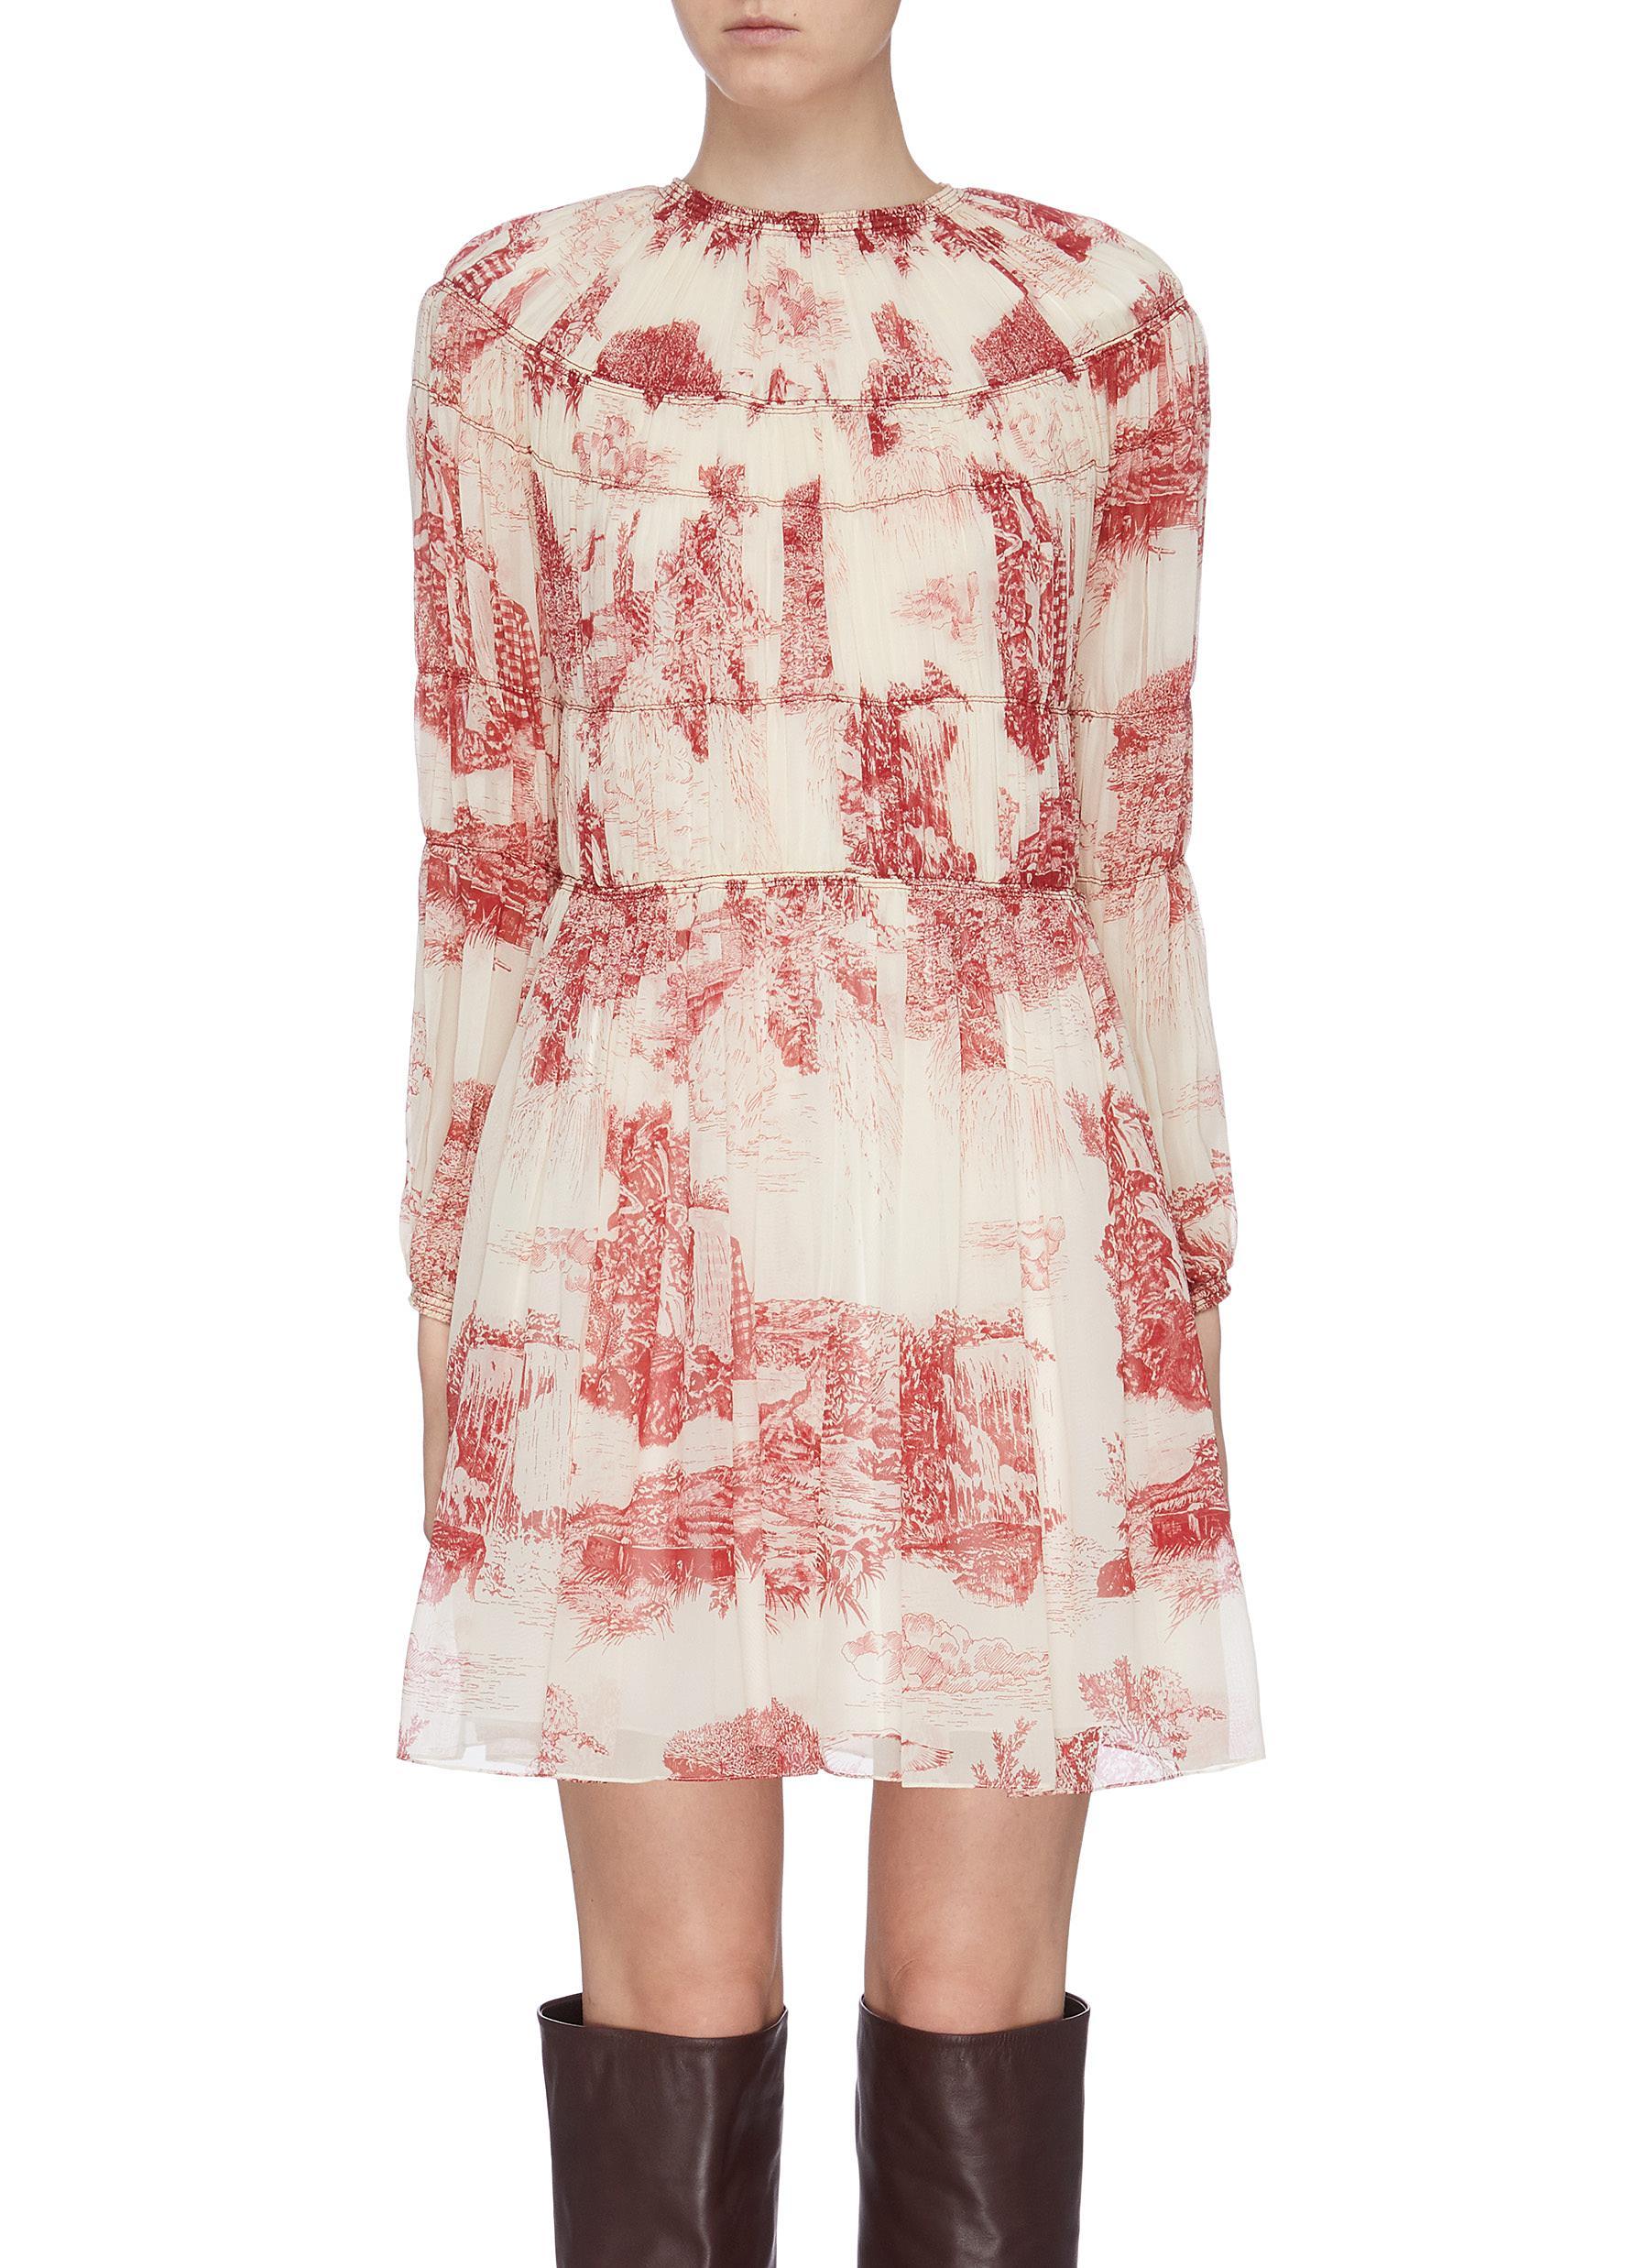 Pleated Toile Du Jouy print silk dress by Chloé